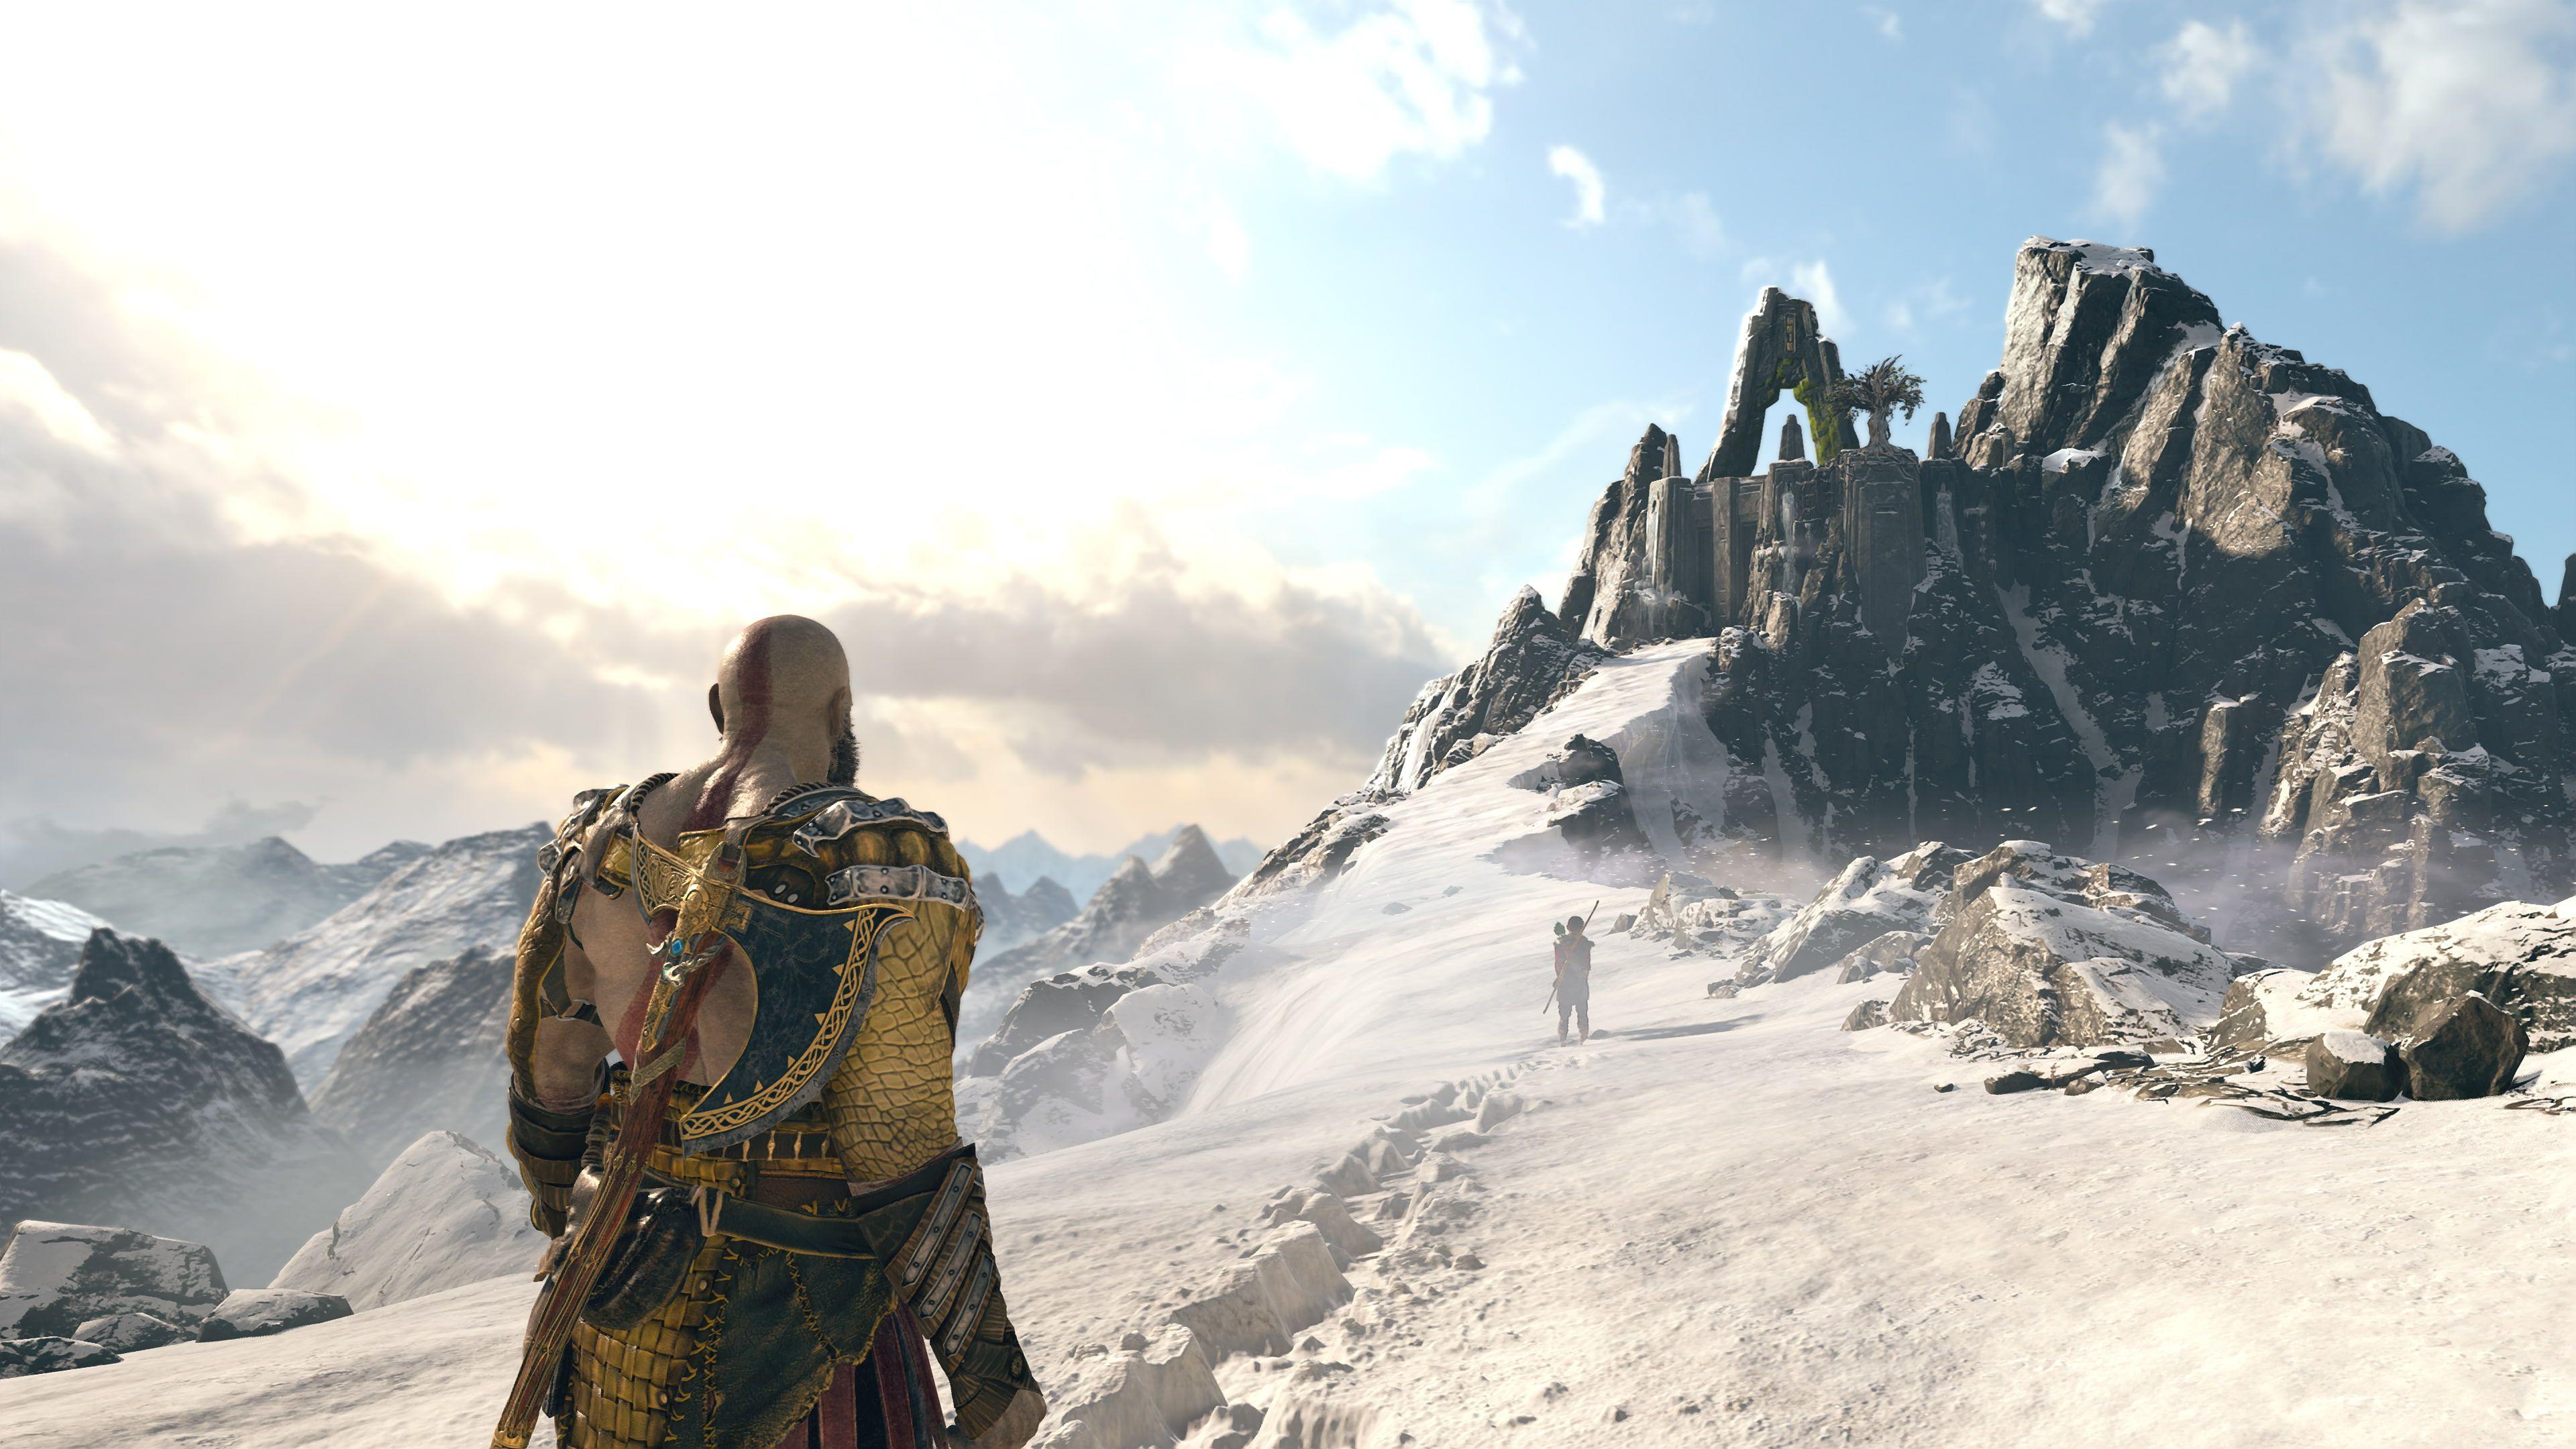 God Of War Kratos Atreus Playstation 4 Norse Mythology 4k Wallpaper Hdwallpaper Desktop In 2021 Norse Mythology God Of War God Of War Kratos And Atreus